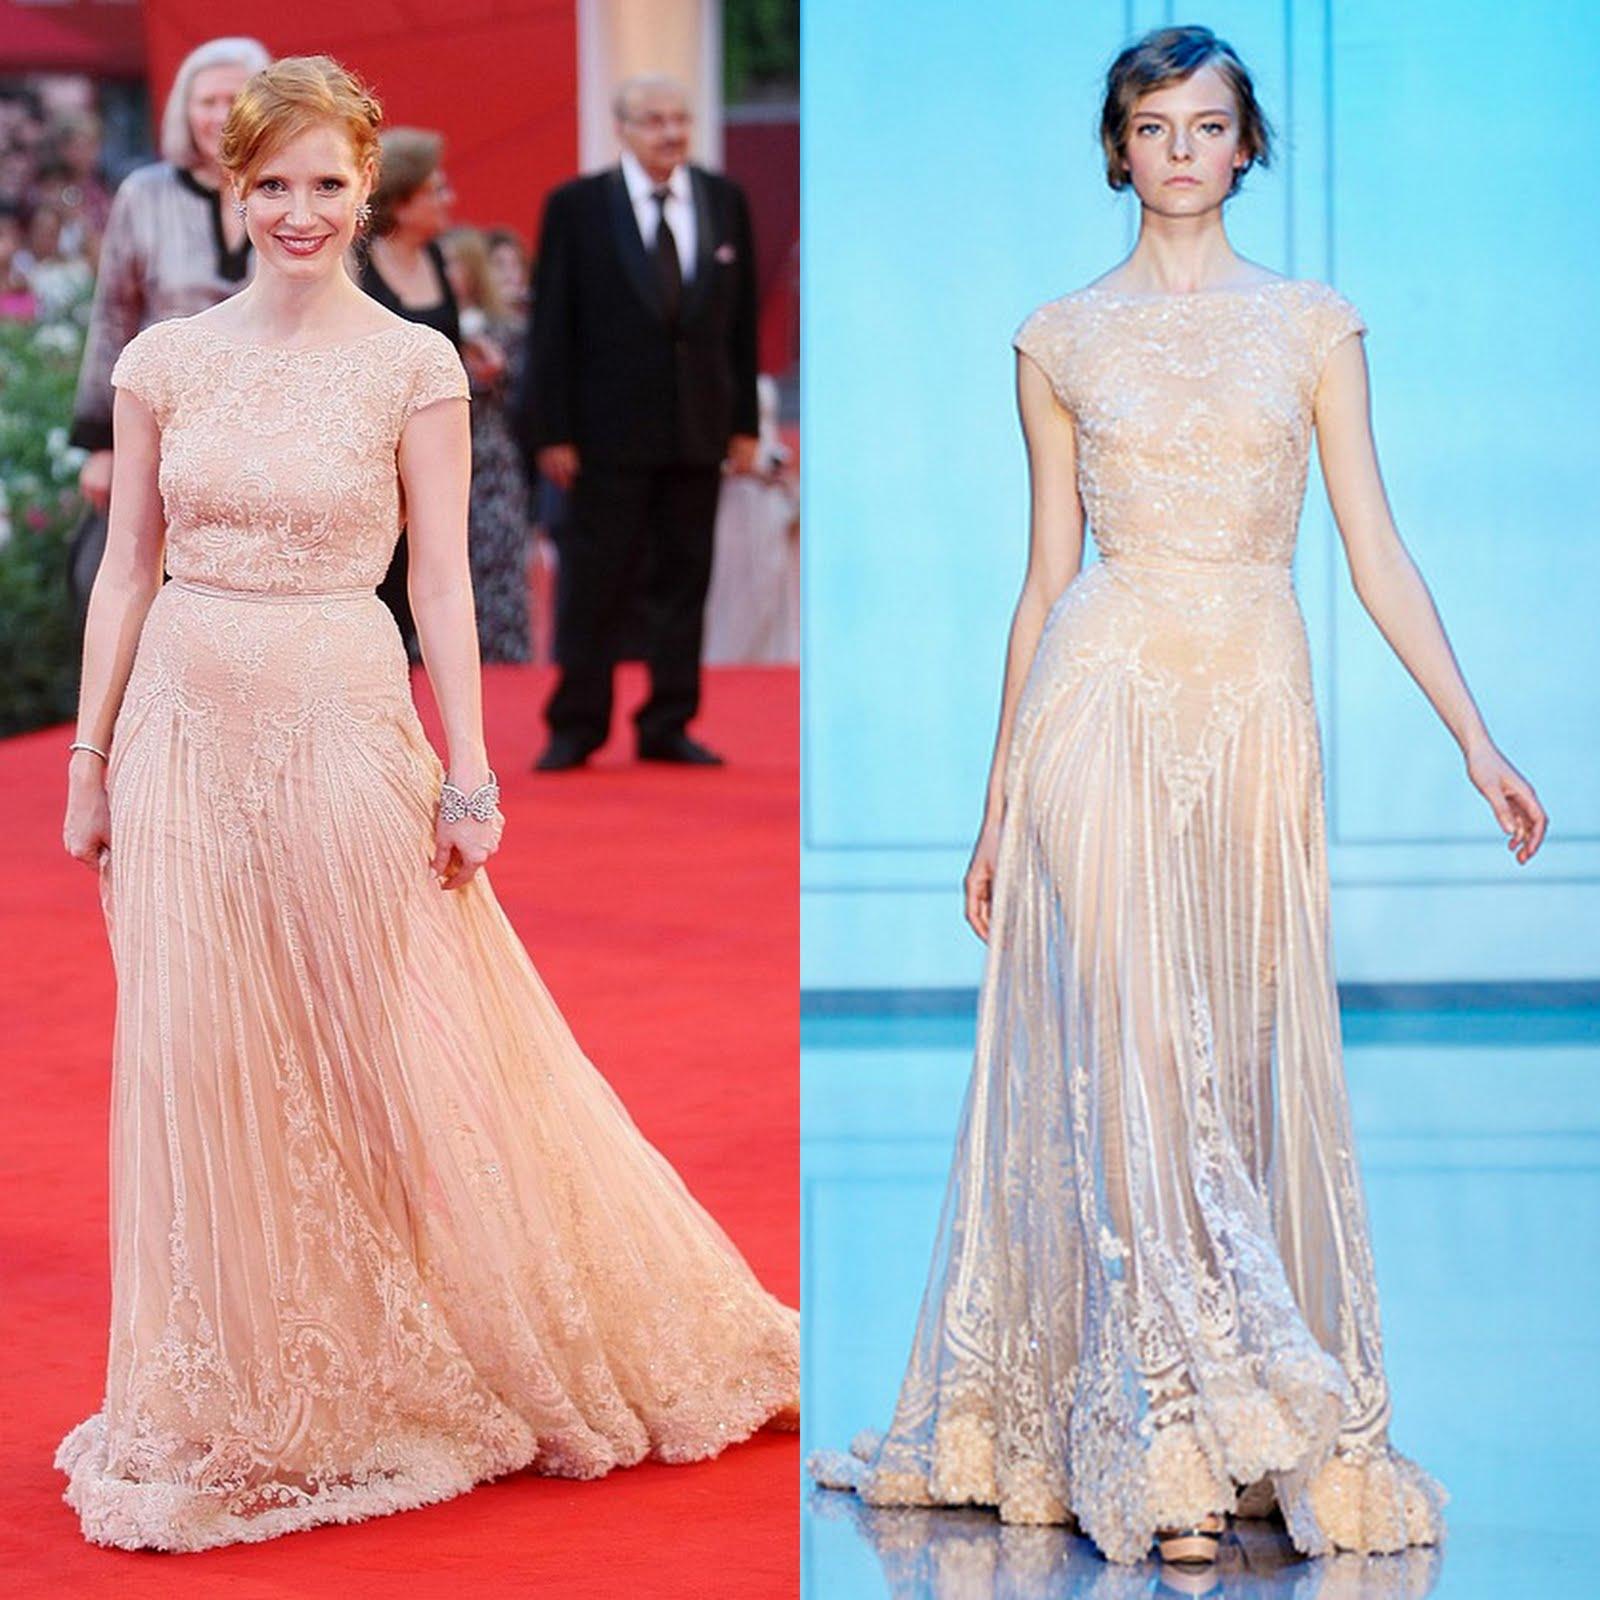 e3930f01e88b Jessica Chastain in That Elie Saab Dress | Fashion Naturally